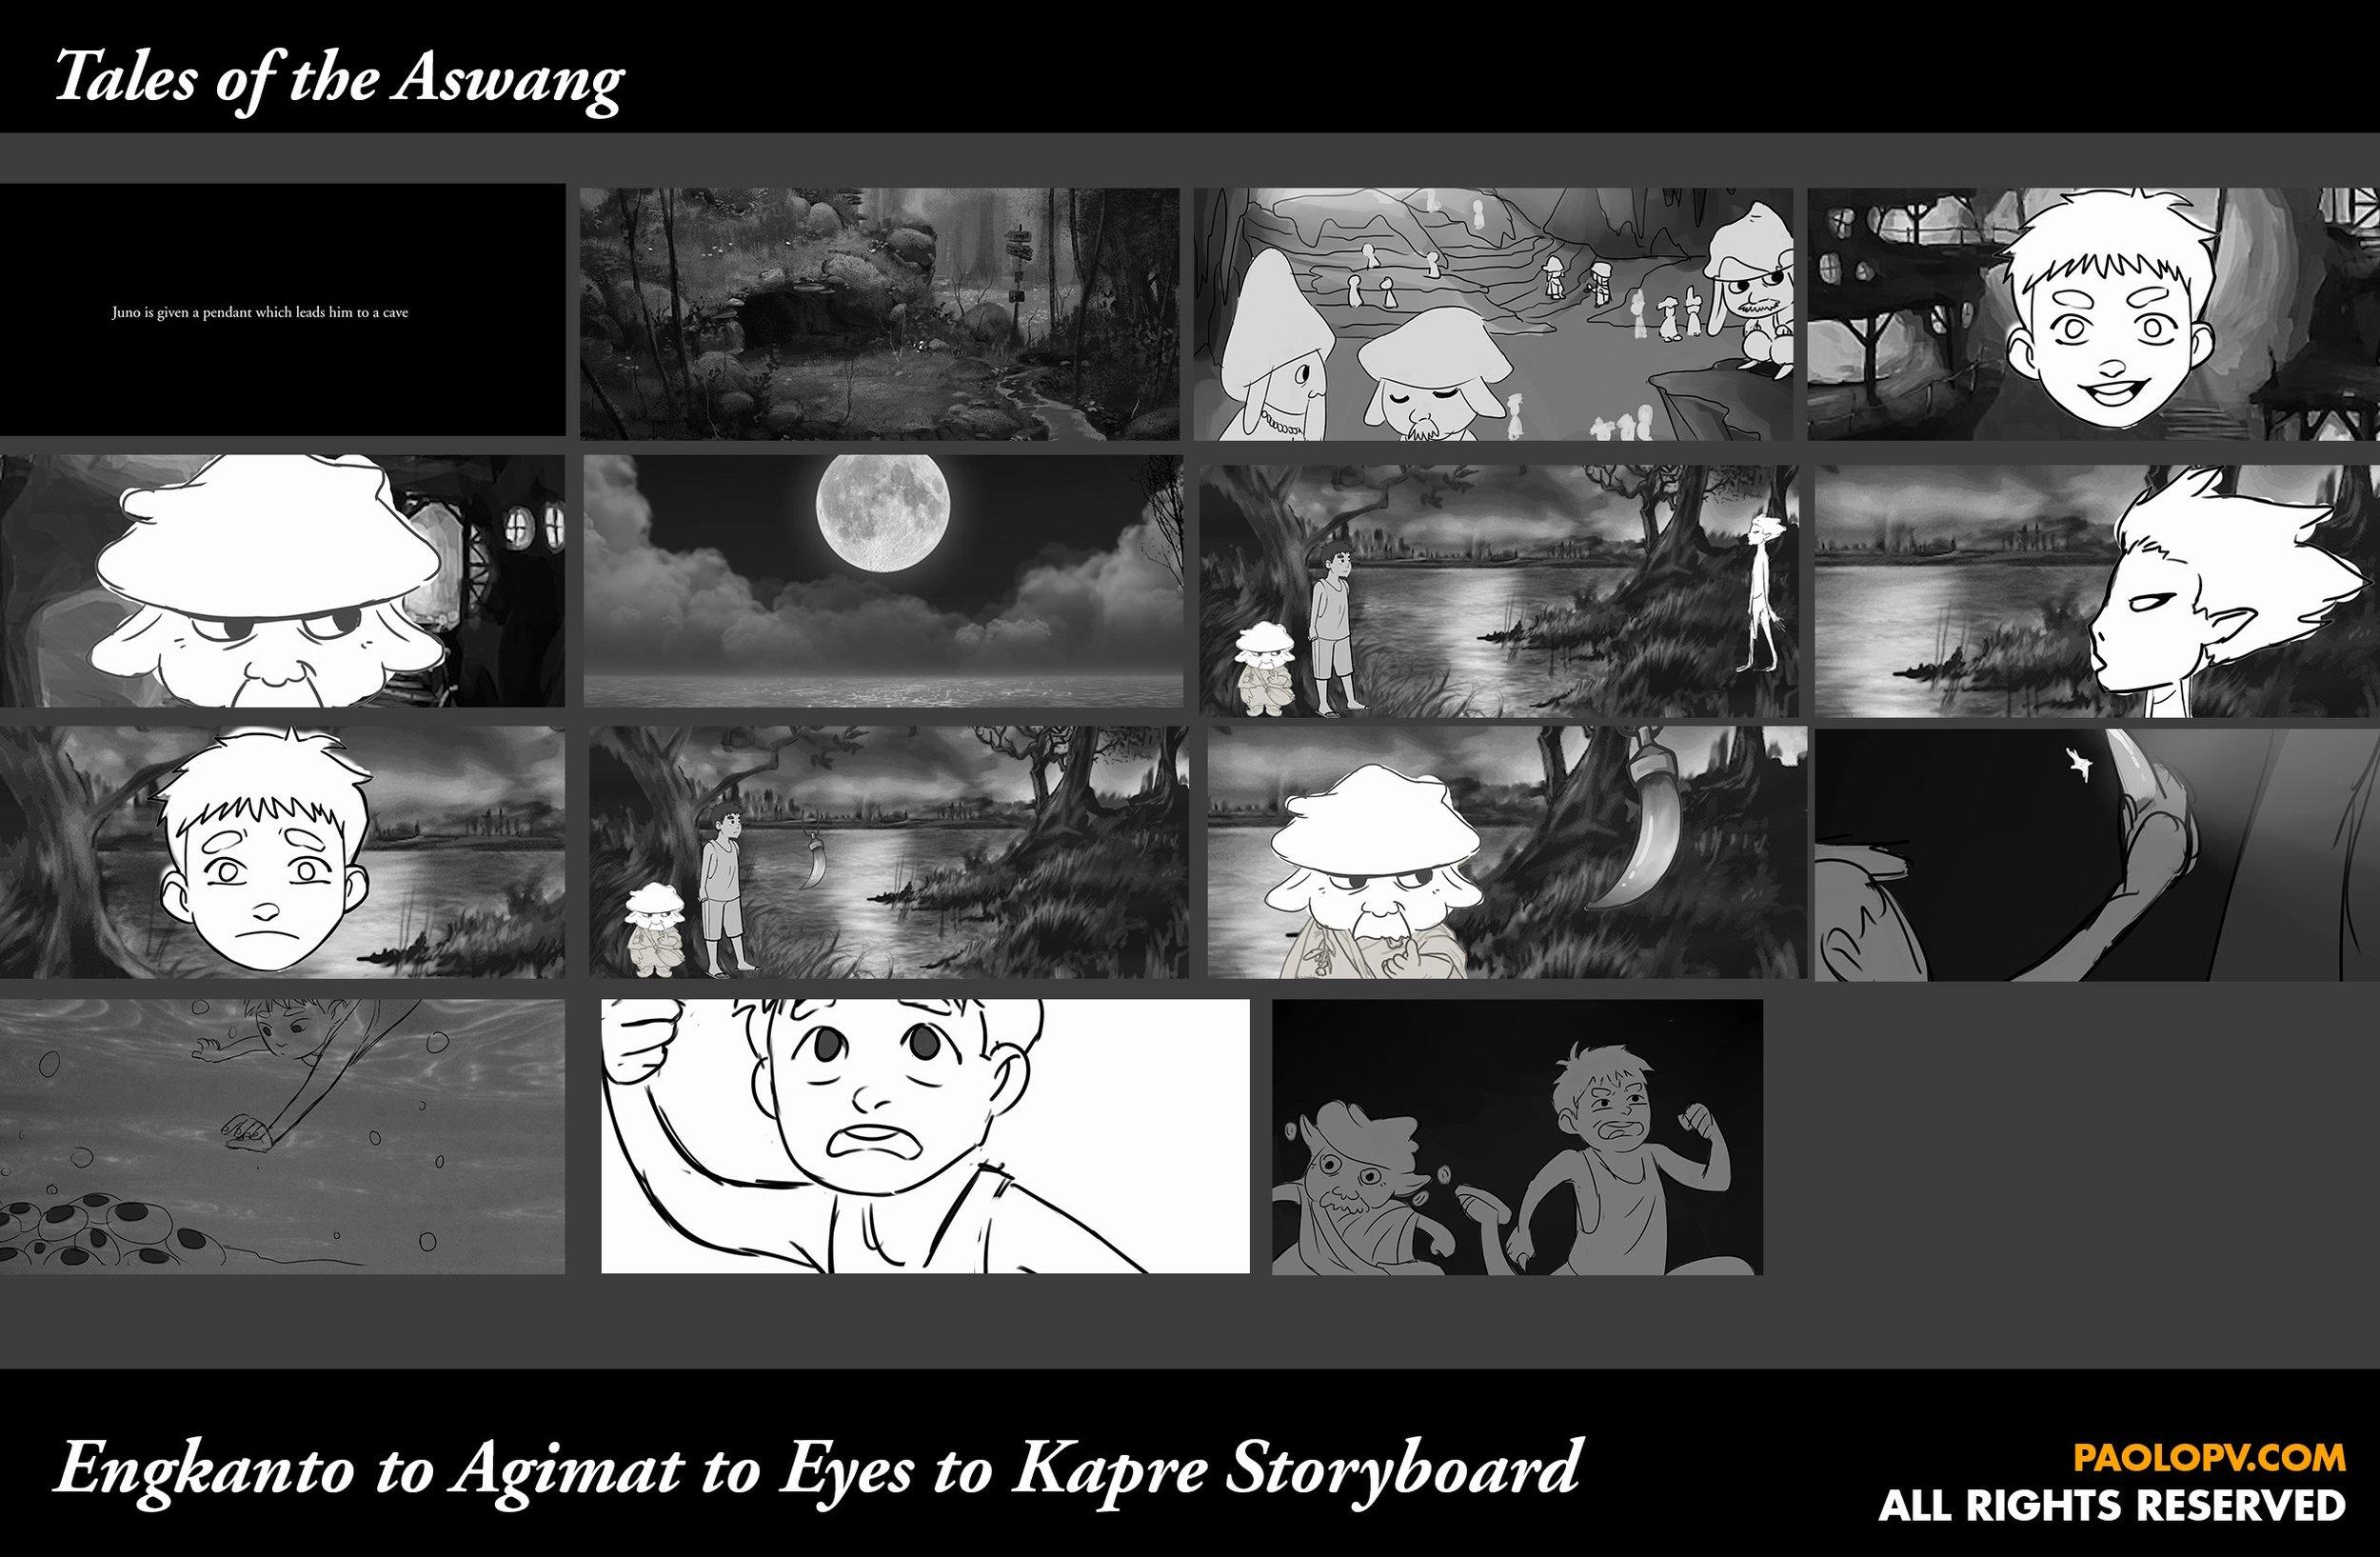 Engkanto-to-Agimat-to-Eyes-to-Kapre-Storyboard.jpg